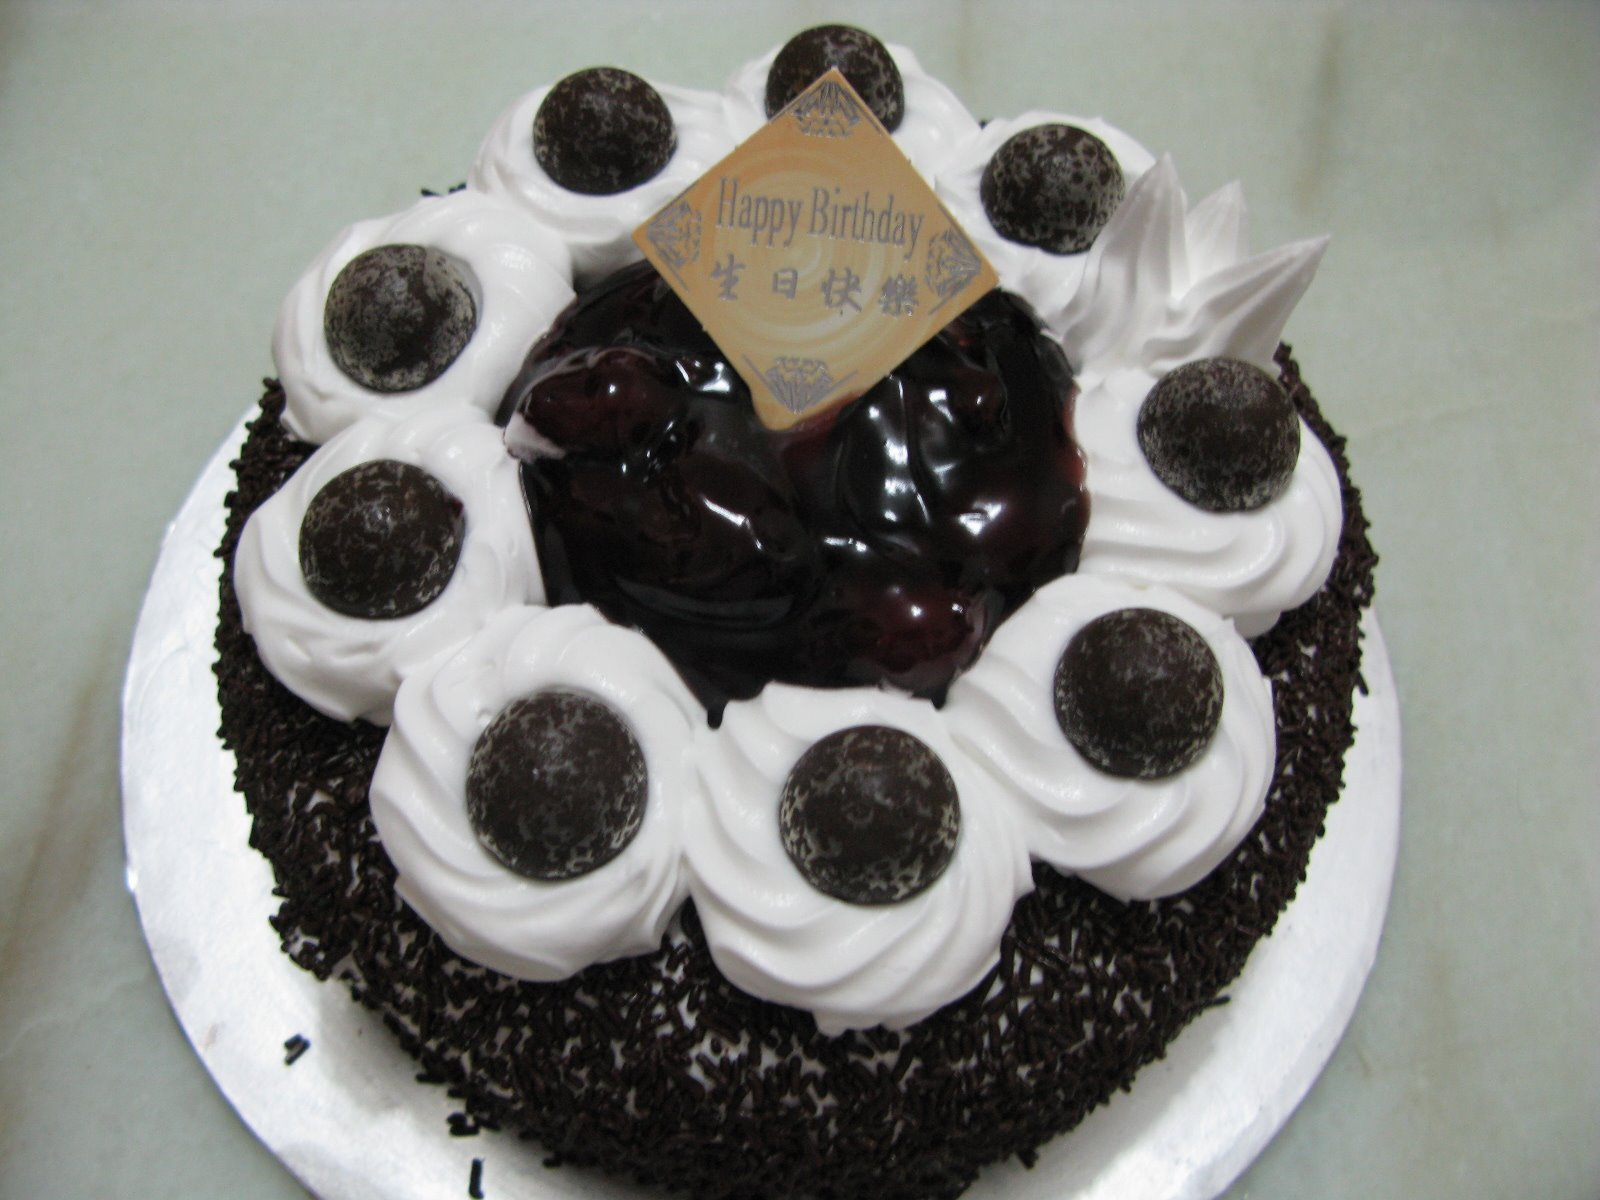 Yun s Life: Big Brother s Birthday